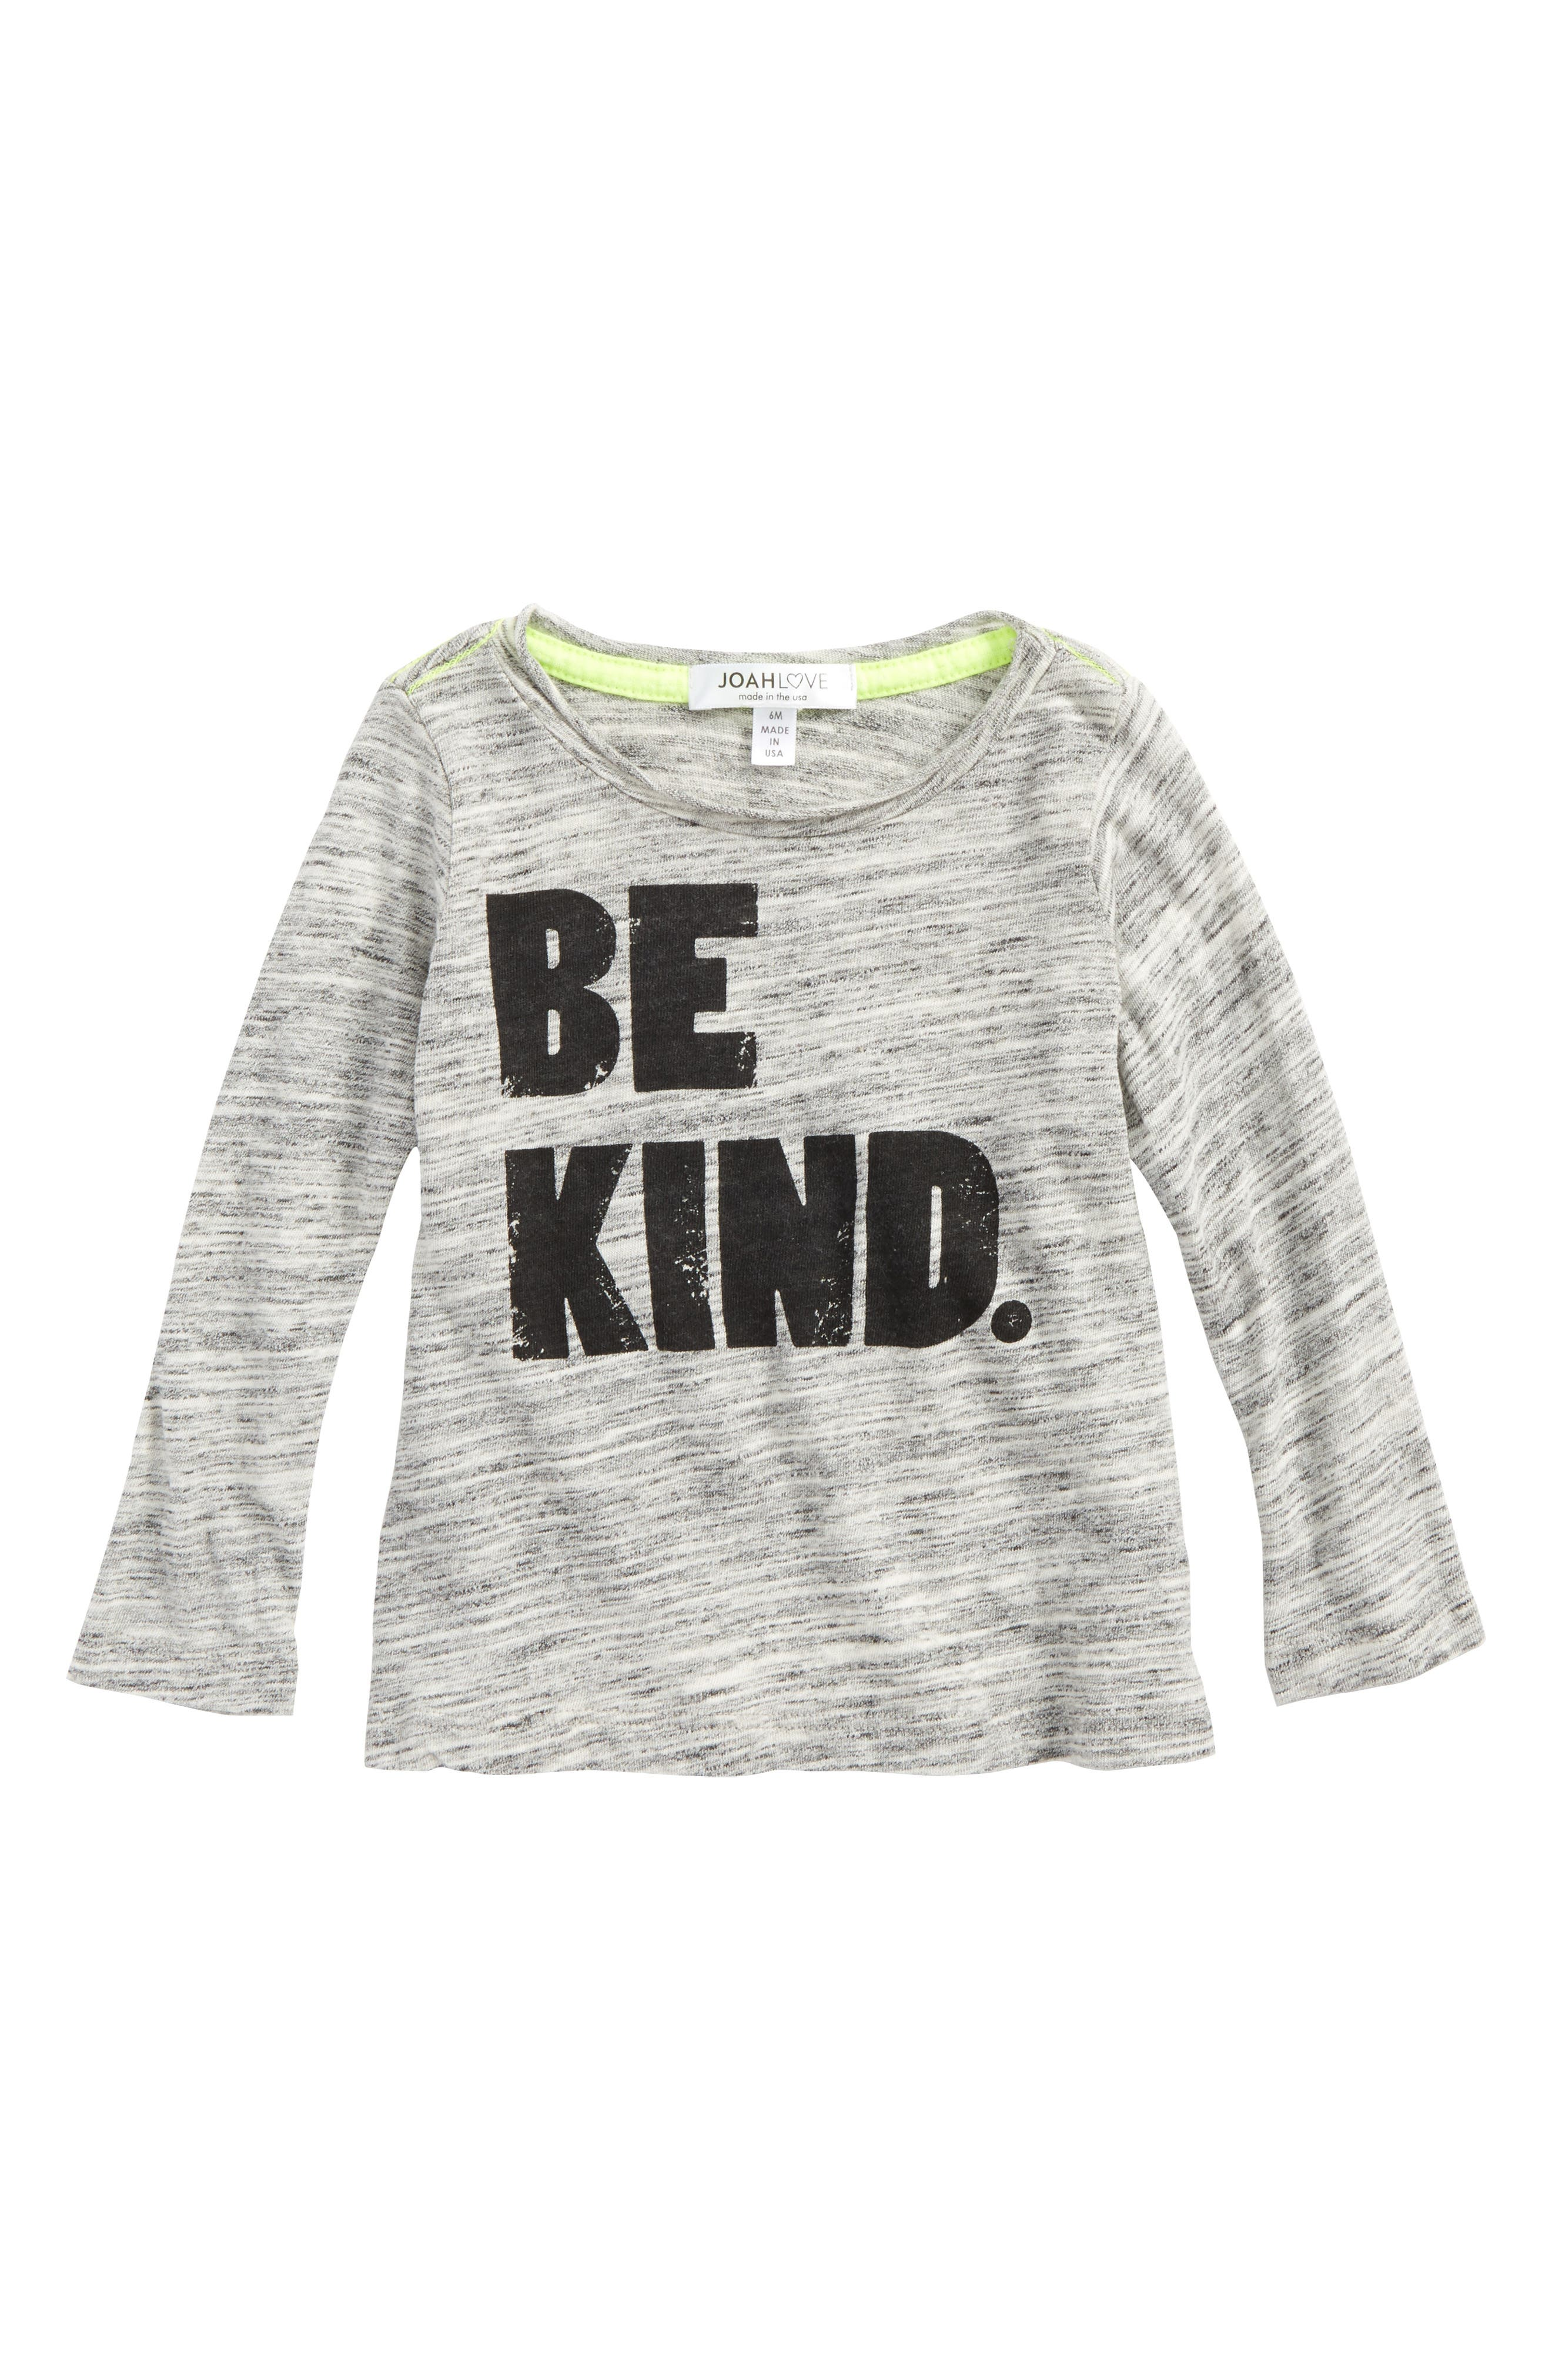 Main Image - Joah Love Be Kind Graphic Shirt (Baby Girls)